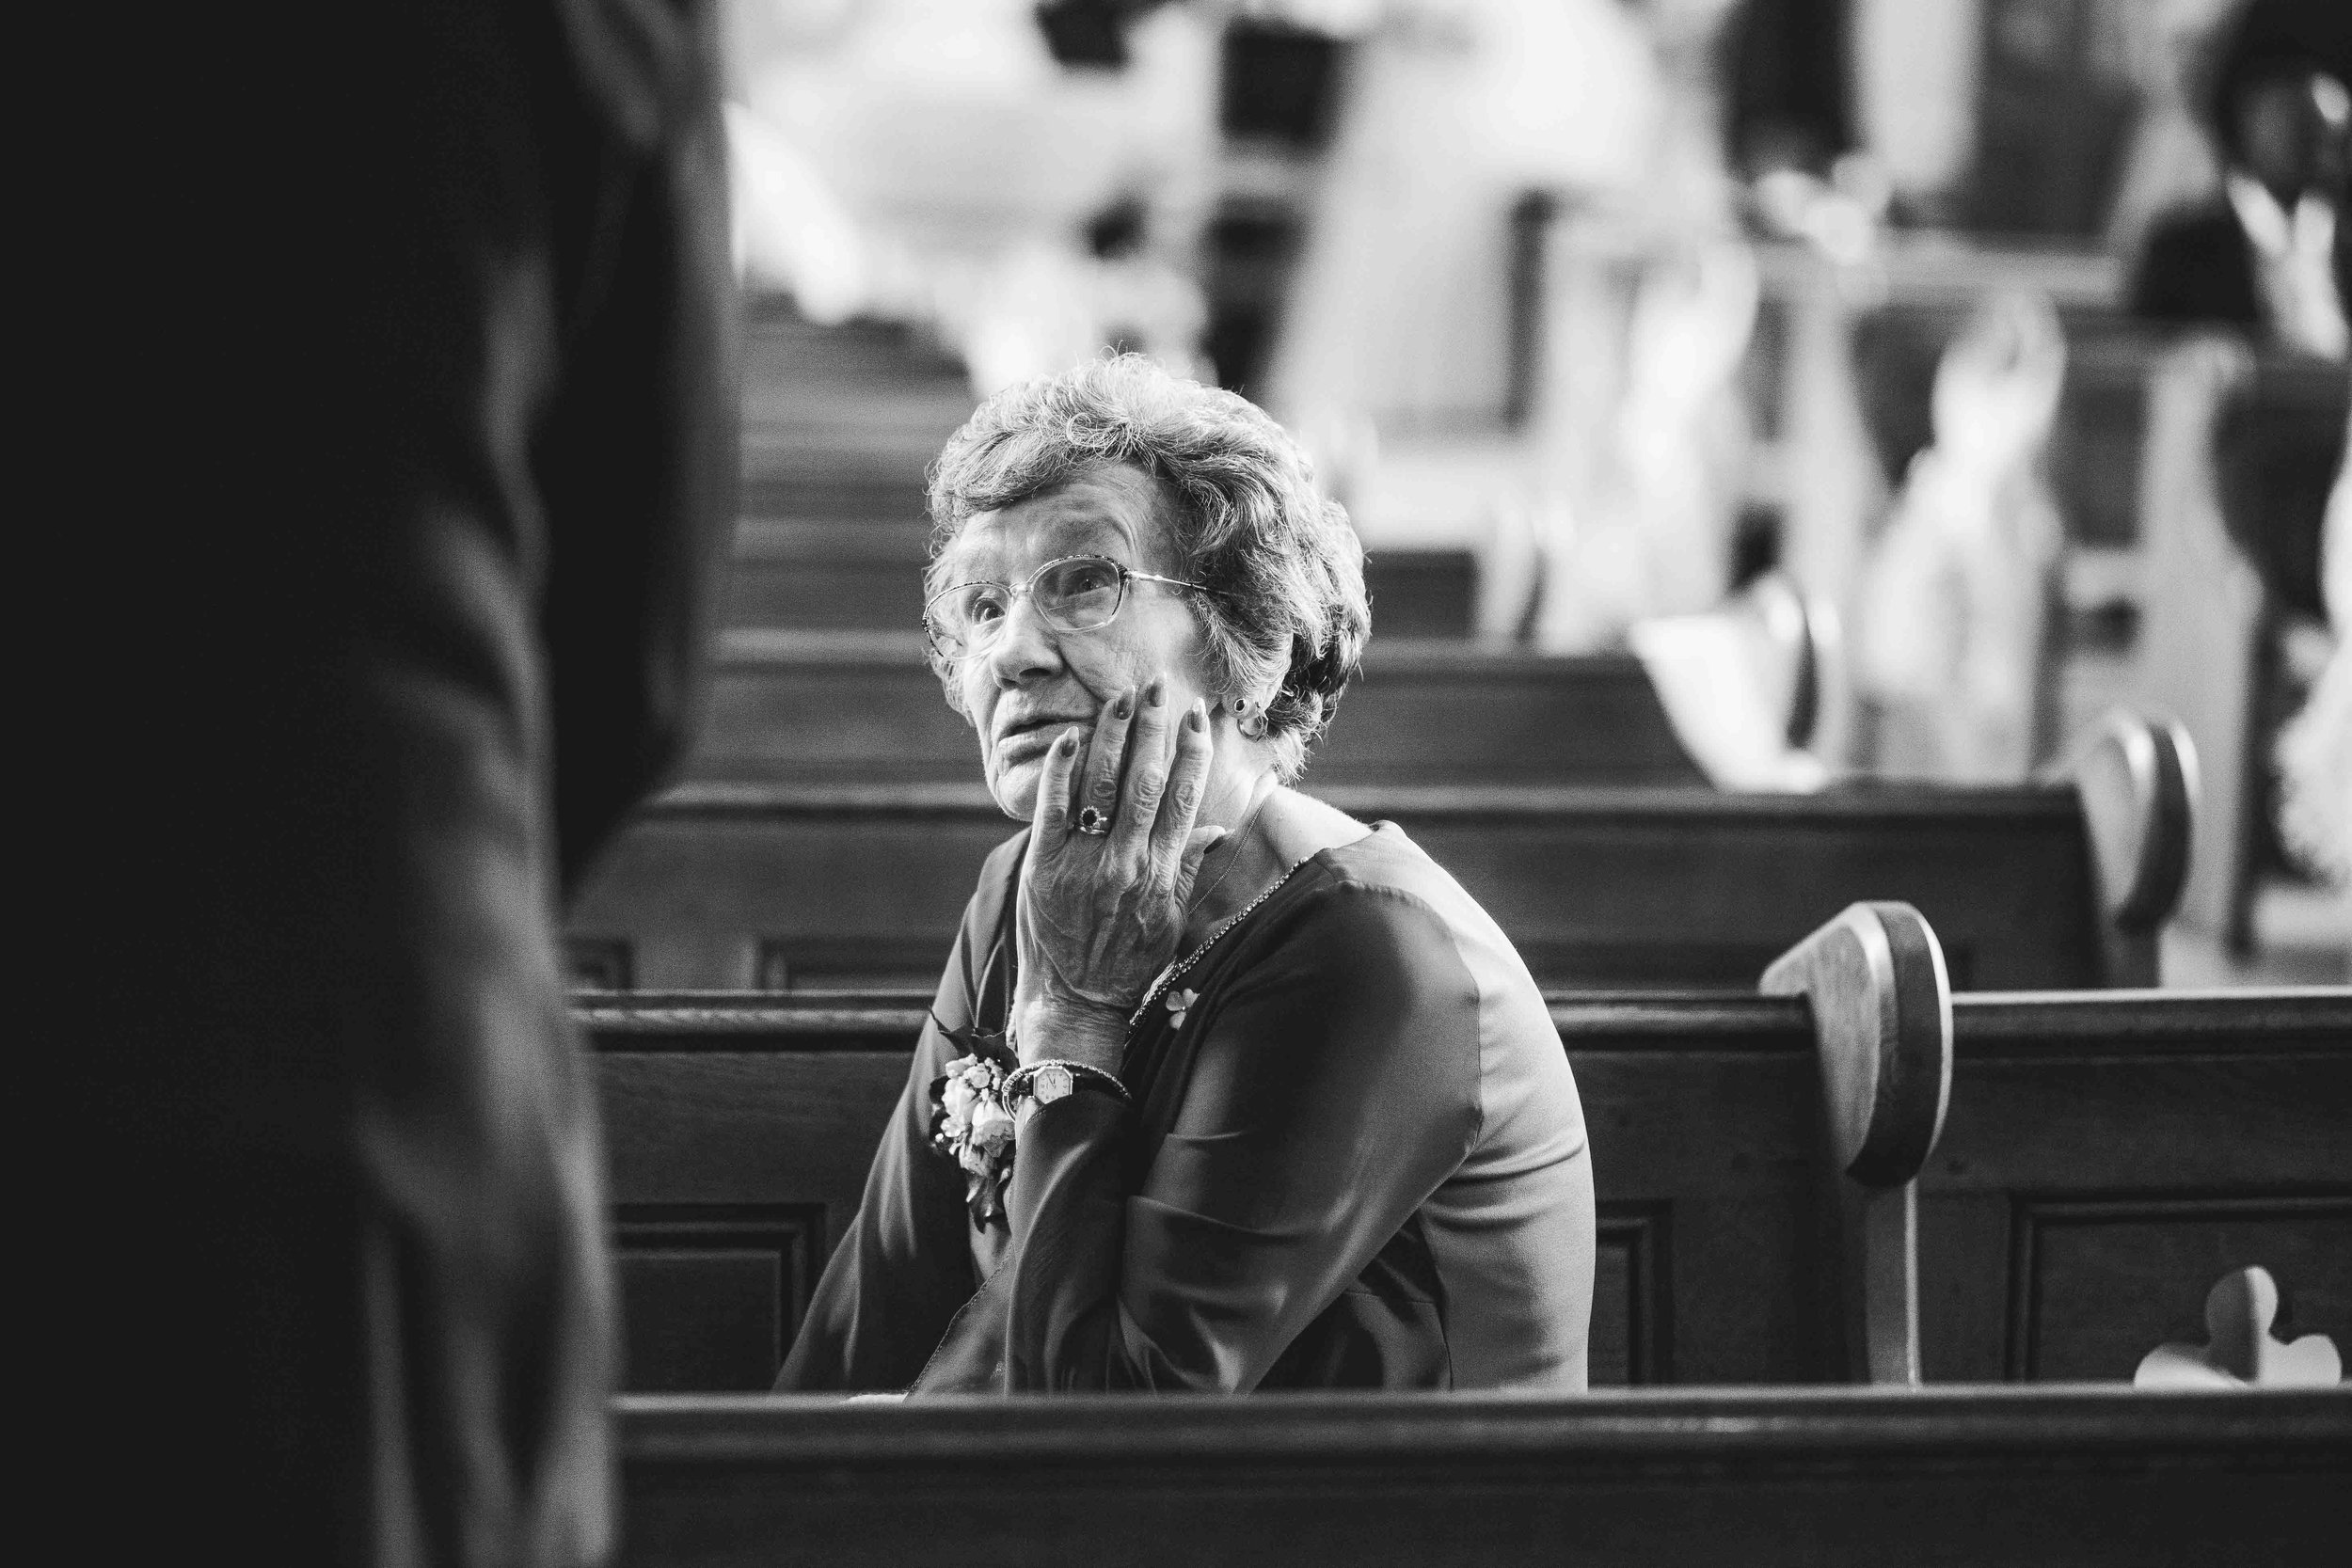 Lea-cooper-photography-willenhall-wolverhampton-wedding-photographer-birmingham-shirley-west-midlands-ceremony-church-7.JPG